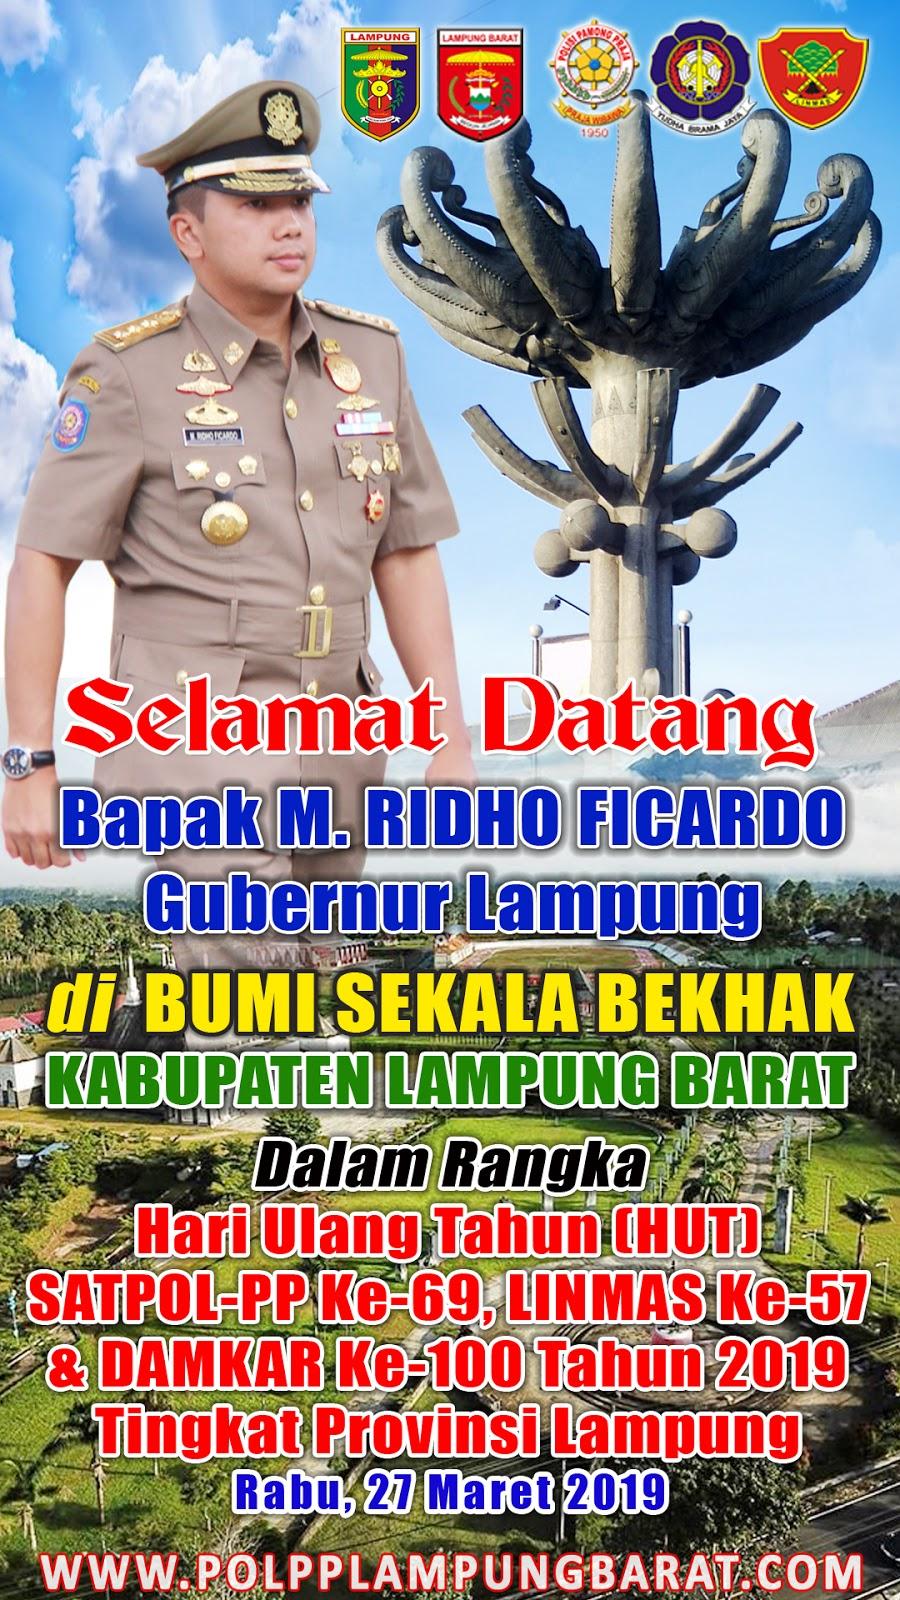 Banner, Baliho, Spanduk Peringatan HUT Satpol PP Ke-69 ...